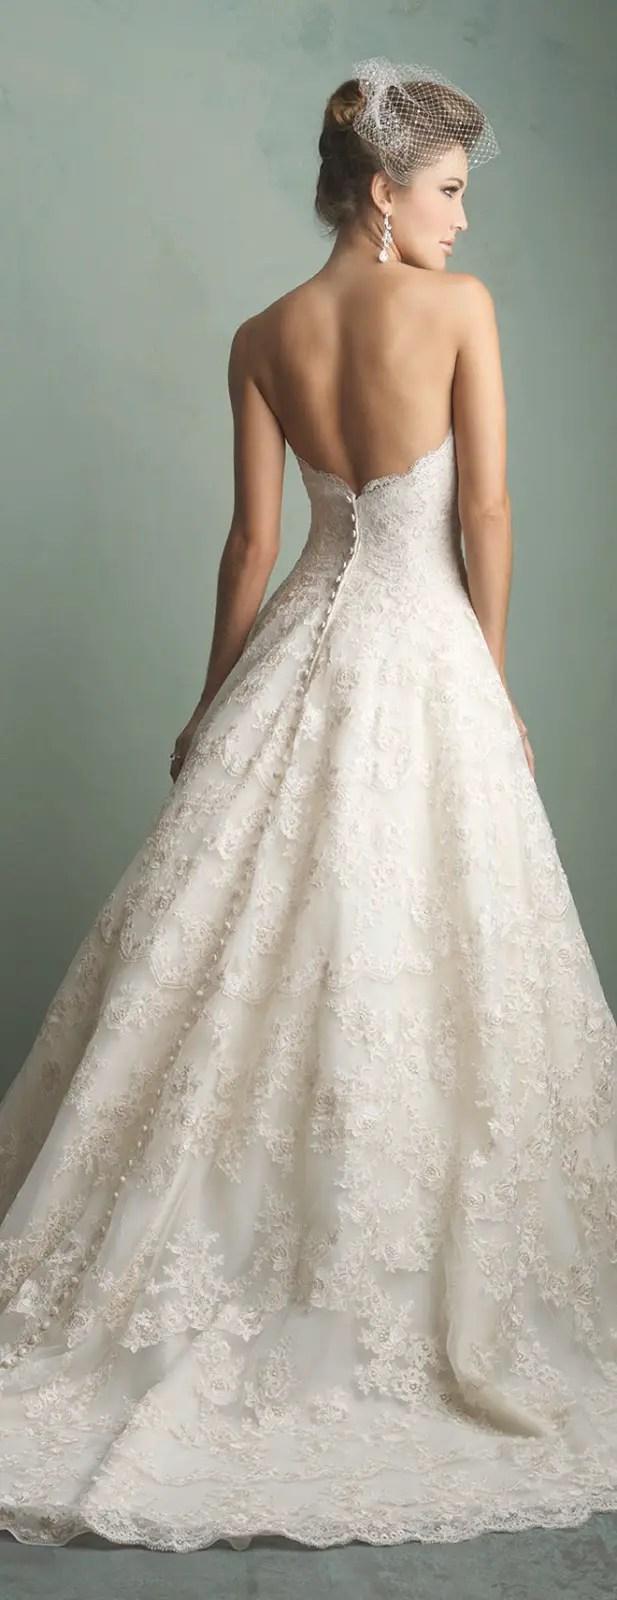 best wedding dresses of best wedding dresses Best Wedding Dresses of Allure Bridals